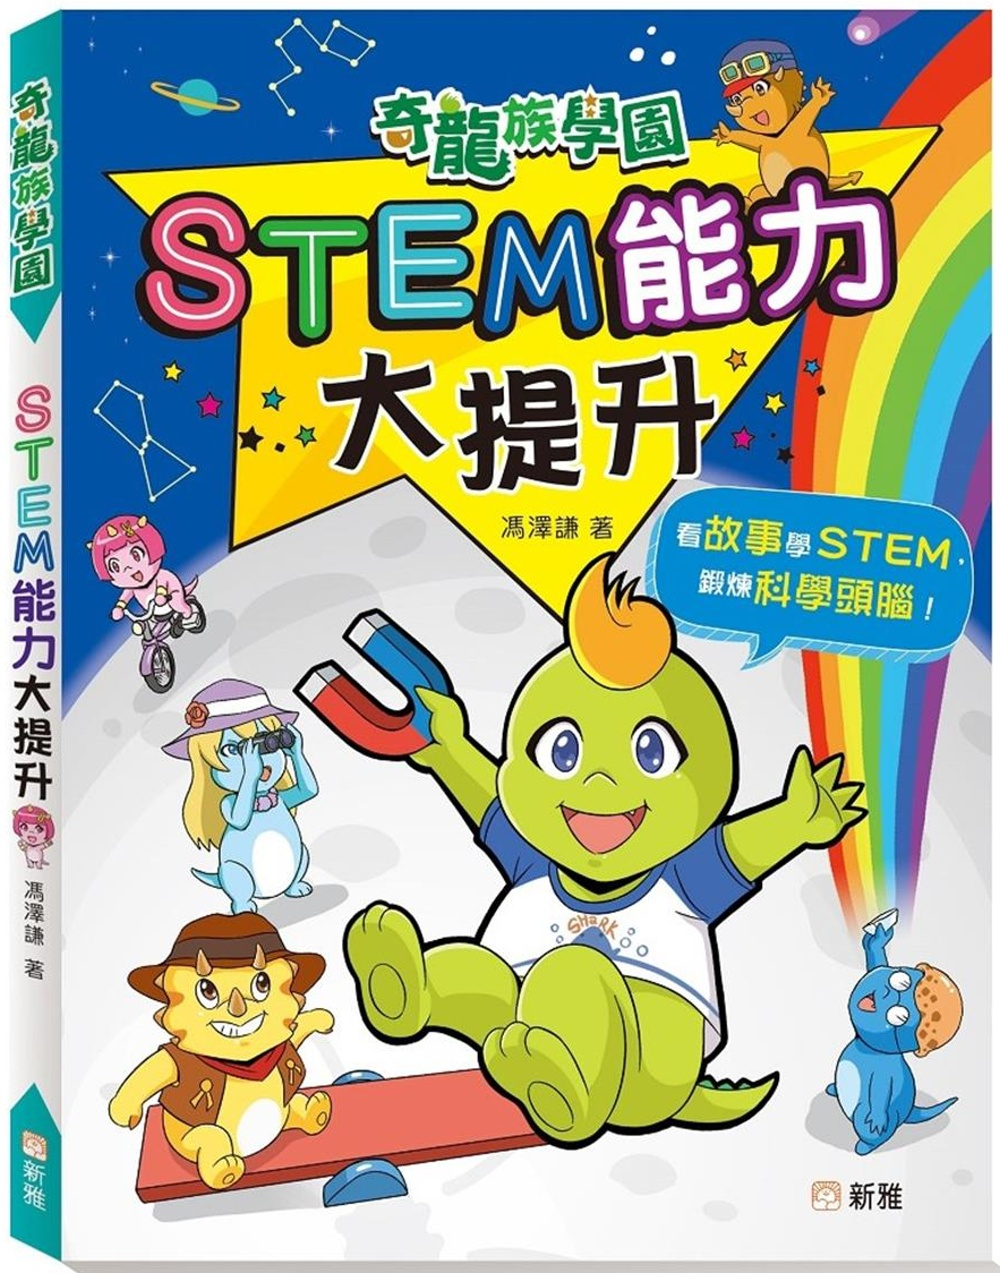 STEM能力大提升【奇龍族學園...